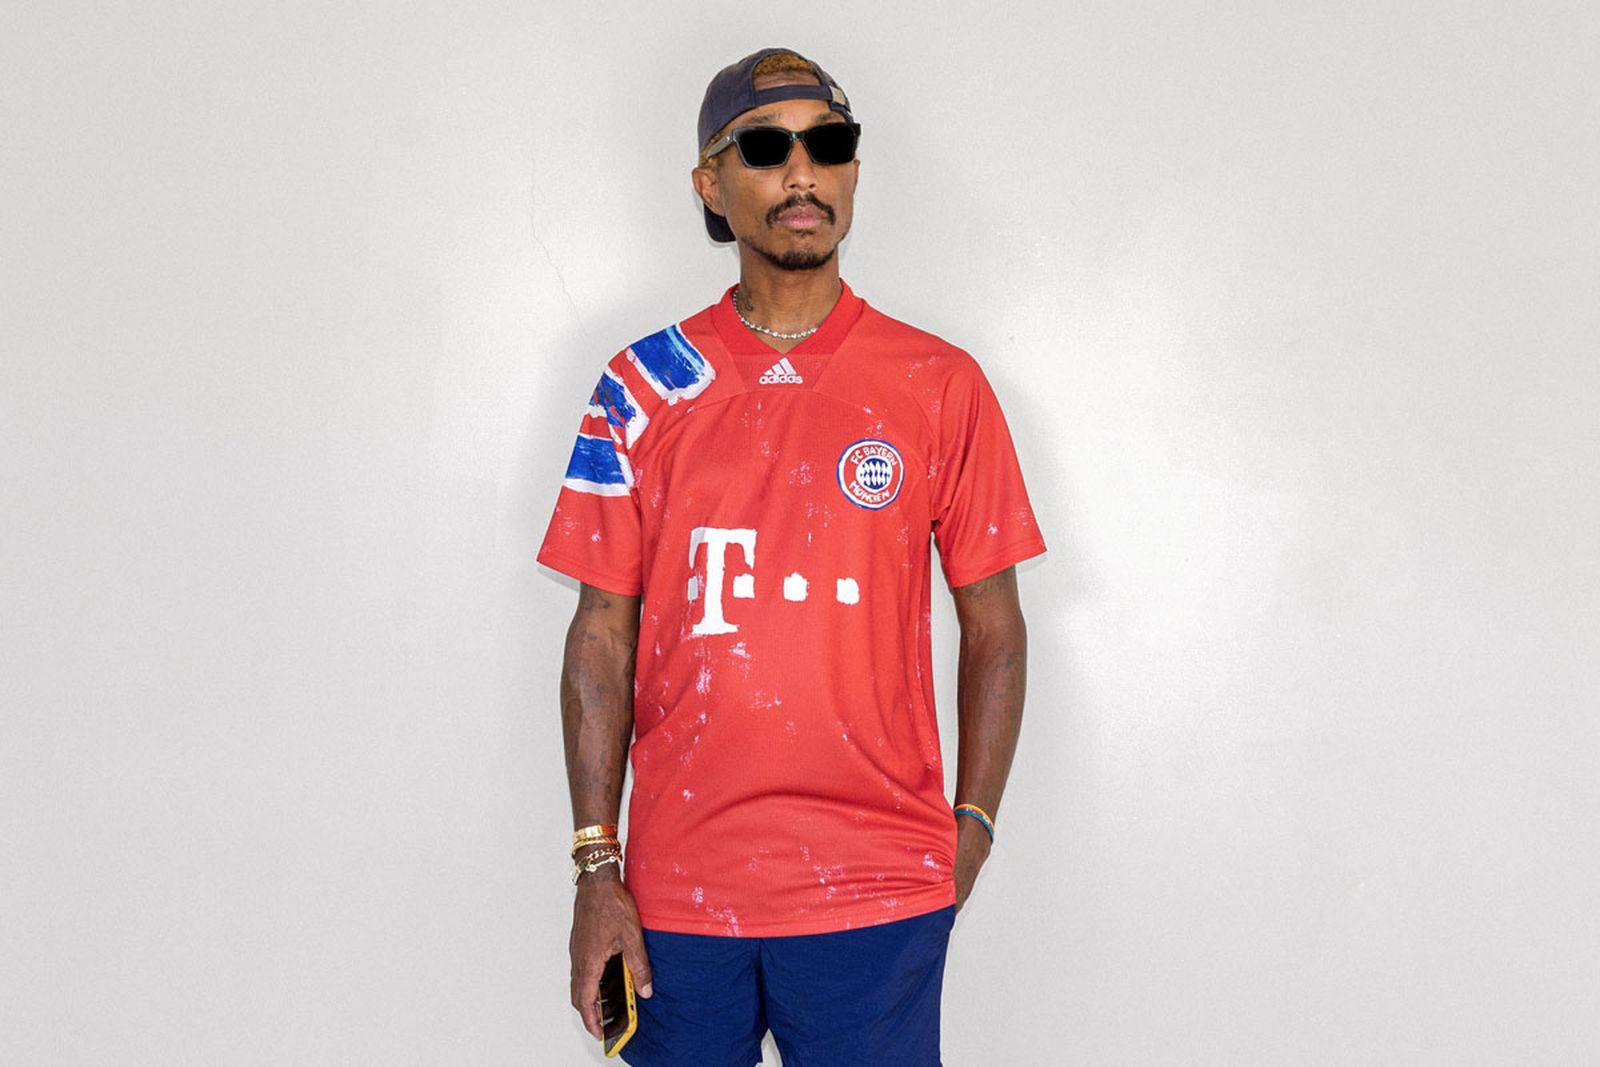 pharrell-williams-adidas-human-race-jerseys-buy-now-06